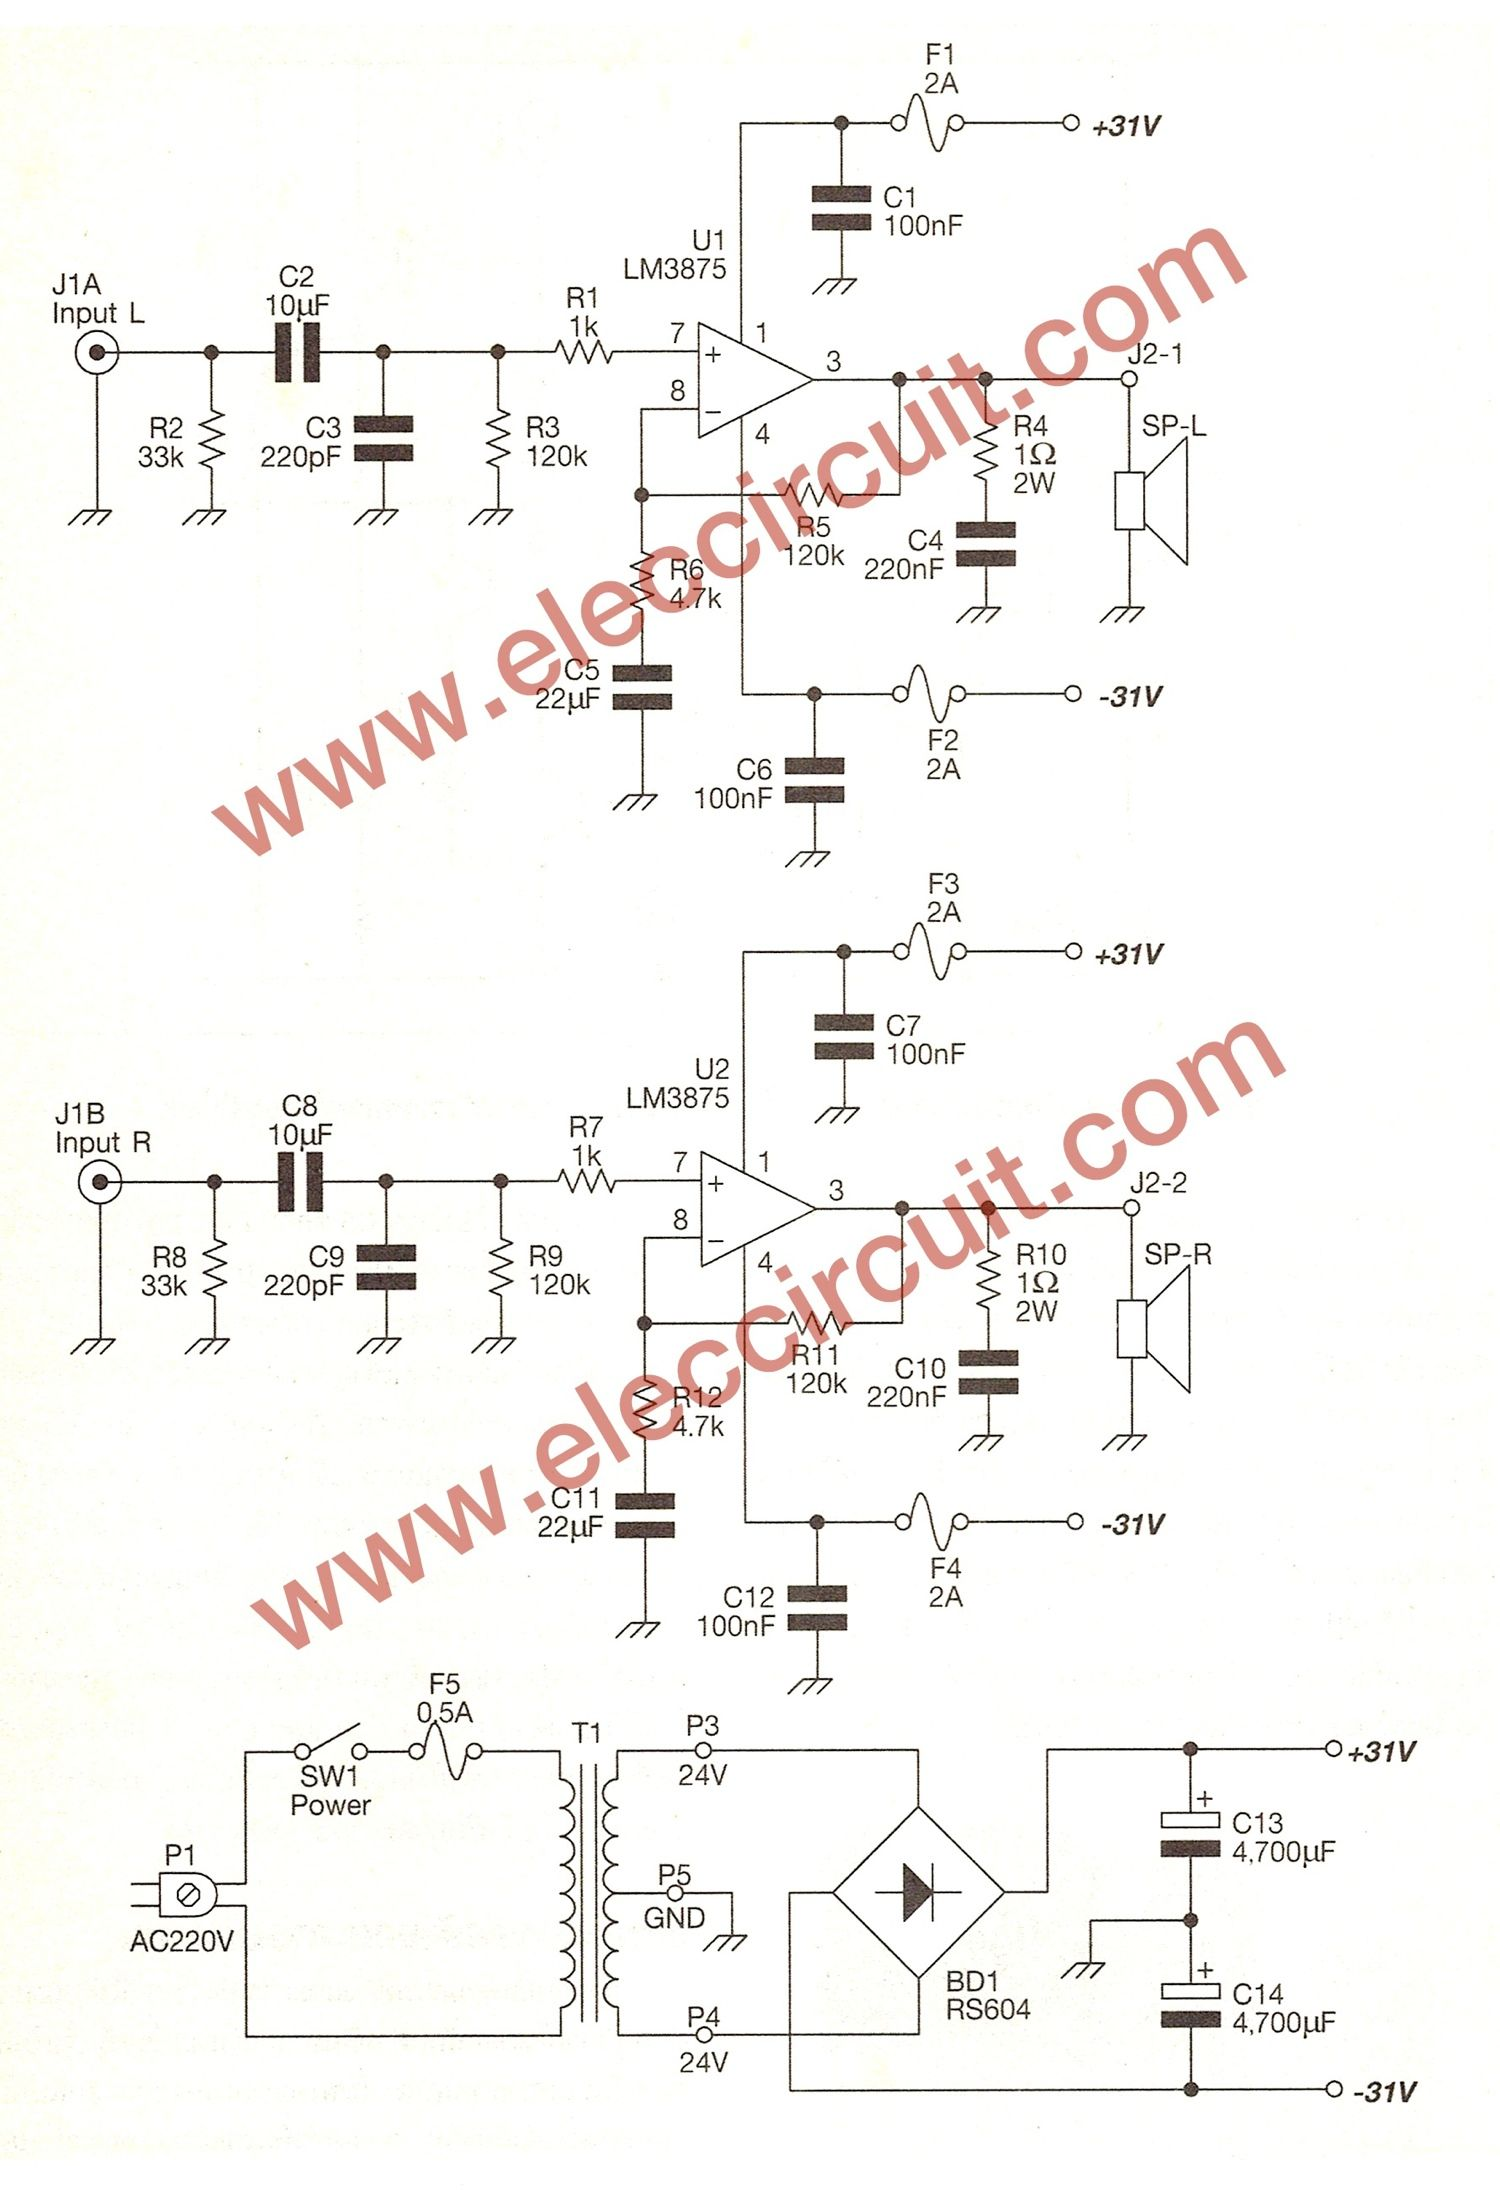 medium resolution of gainclone amplifier circuit stereo 40w using lm3875 eleccircuit amplifier tda2030tda2030 circuitcircuit diagram 14w hifi audio